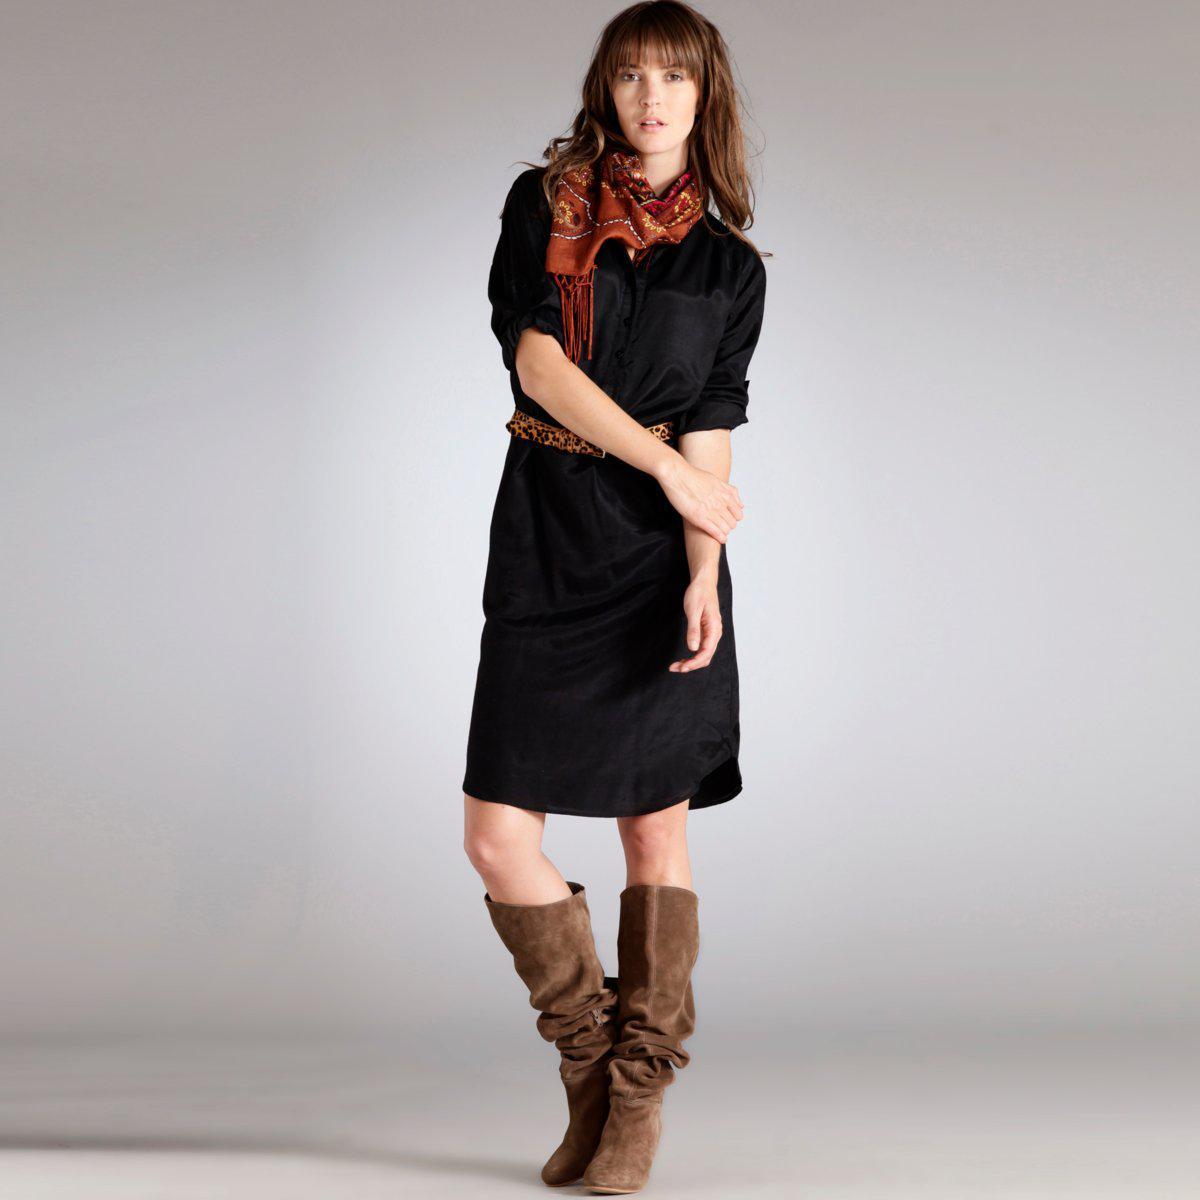 bradyna foremata 262 - Βραδυνα Φορεματα LaRedoute Χειμώνας 2012 Κωδ. 324209642